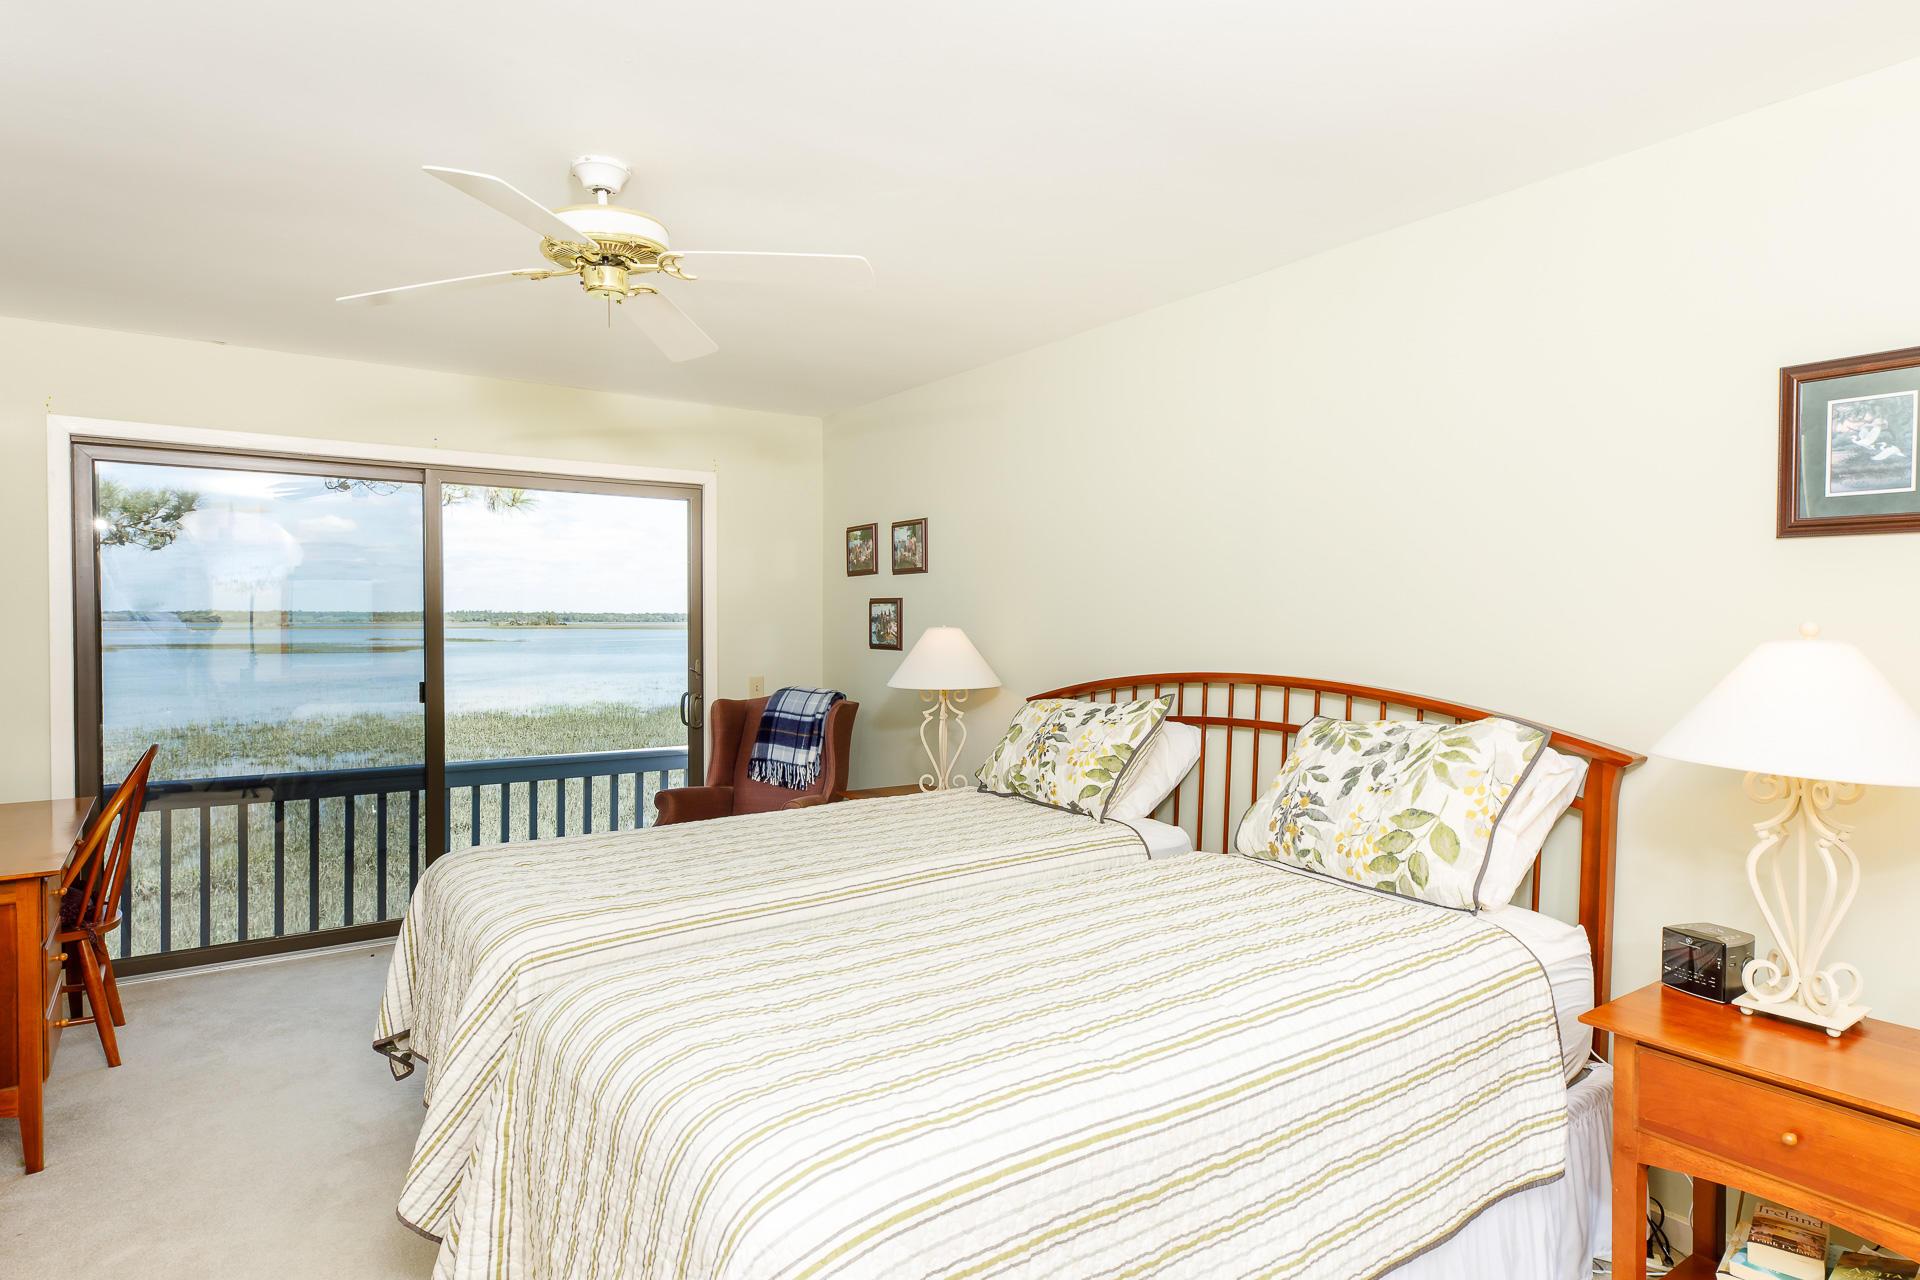 Kiawah Island Homes For Sale - 165 Marsh Hawk, Kiawah Island, SC - 22